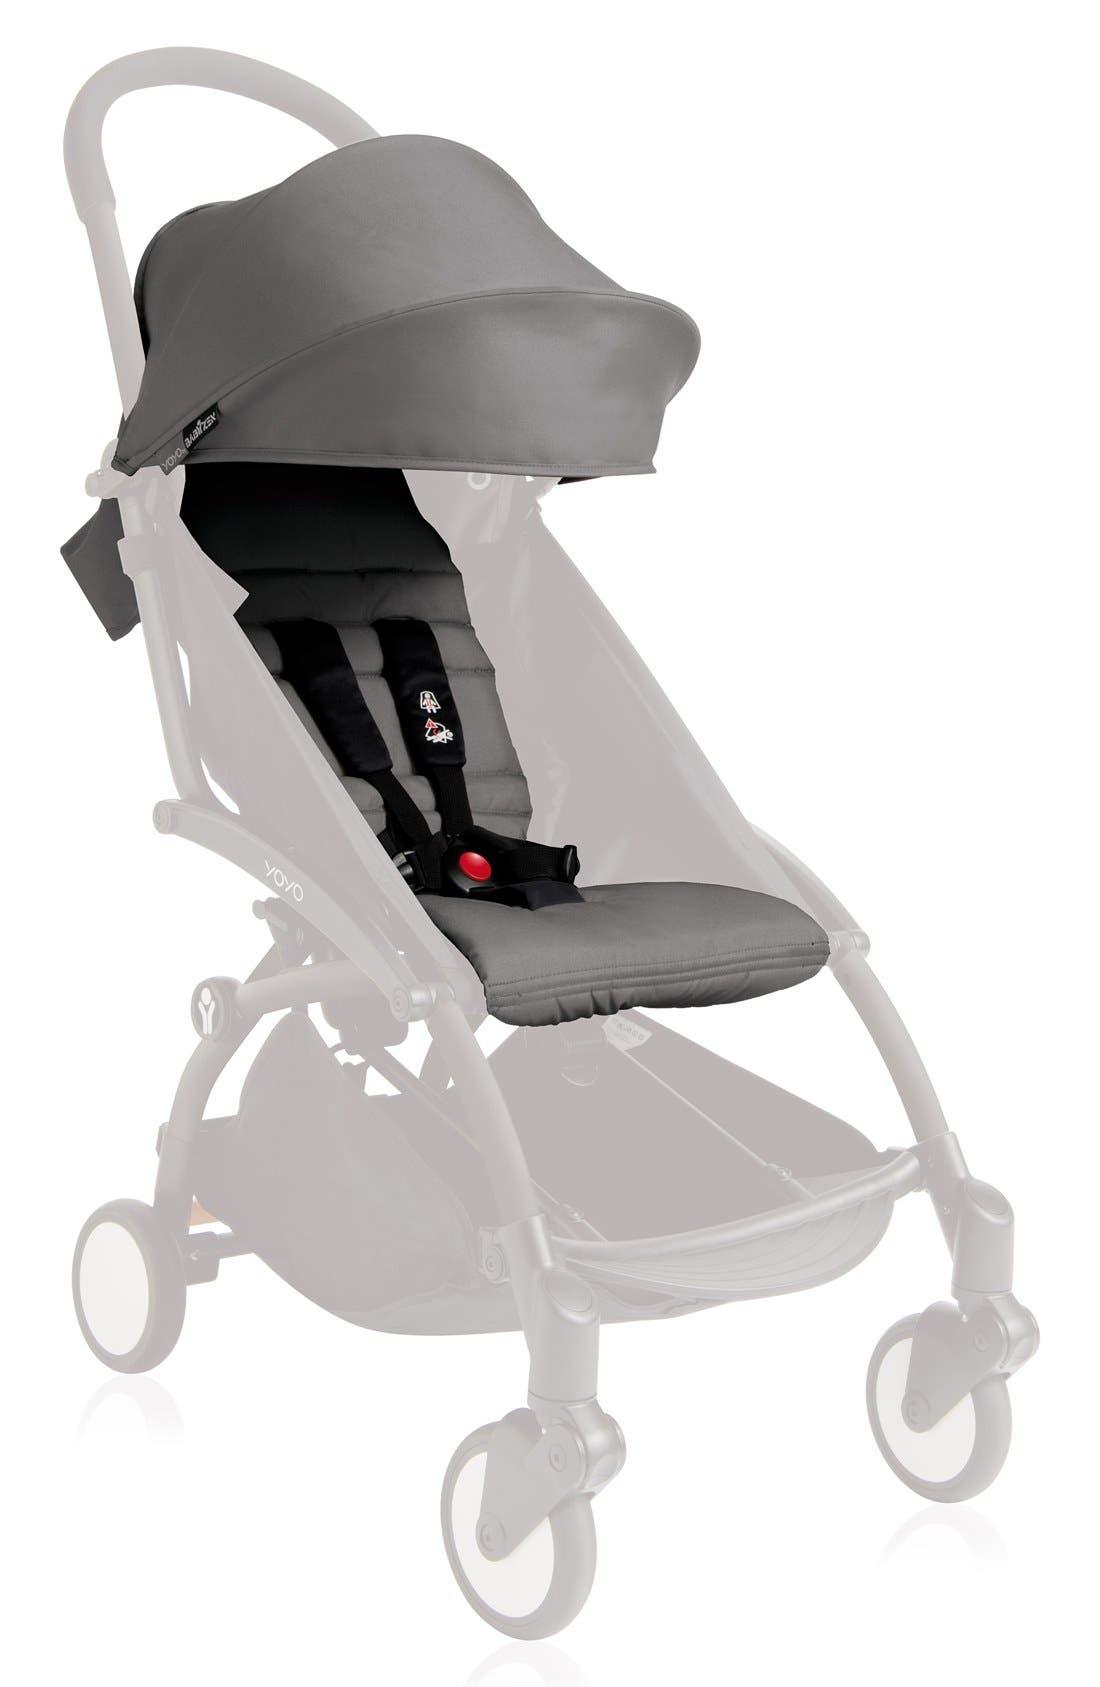 BABYZEN YOYO+ Color Pack Seat/Fabric Set for BABYZEN YOYO+ Stroller Frame,                         Main,                         color, Grey